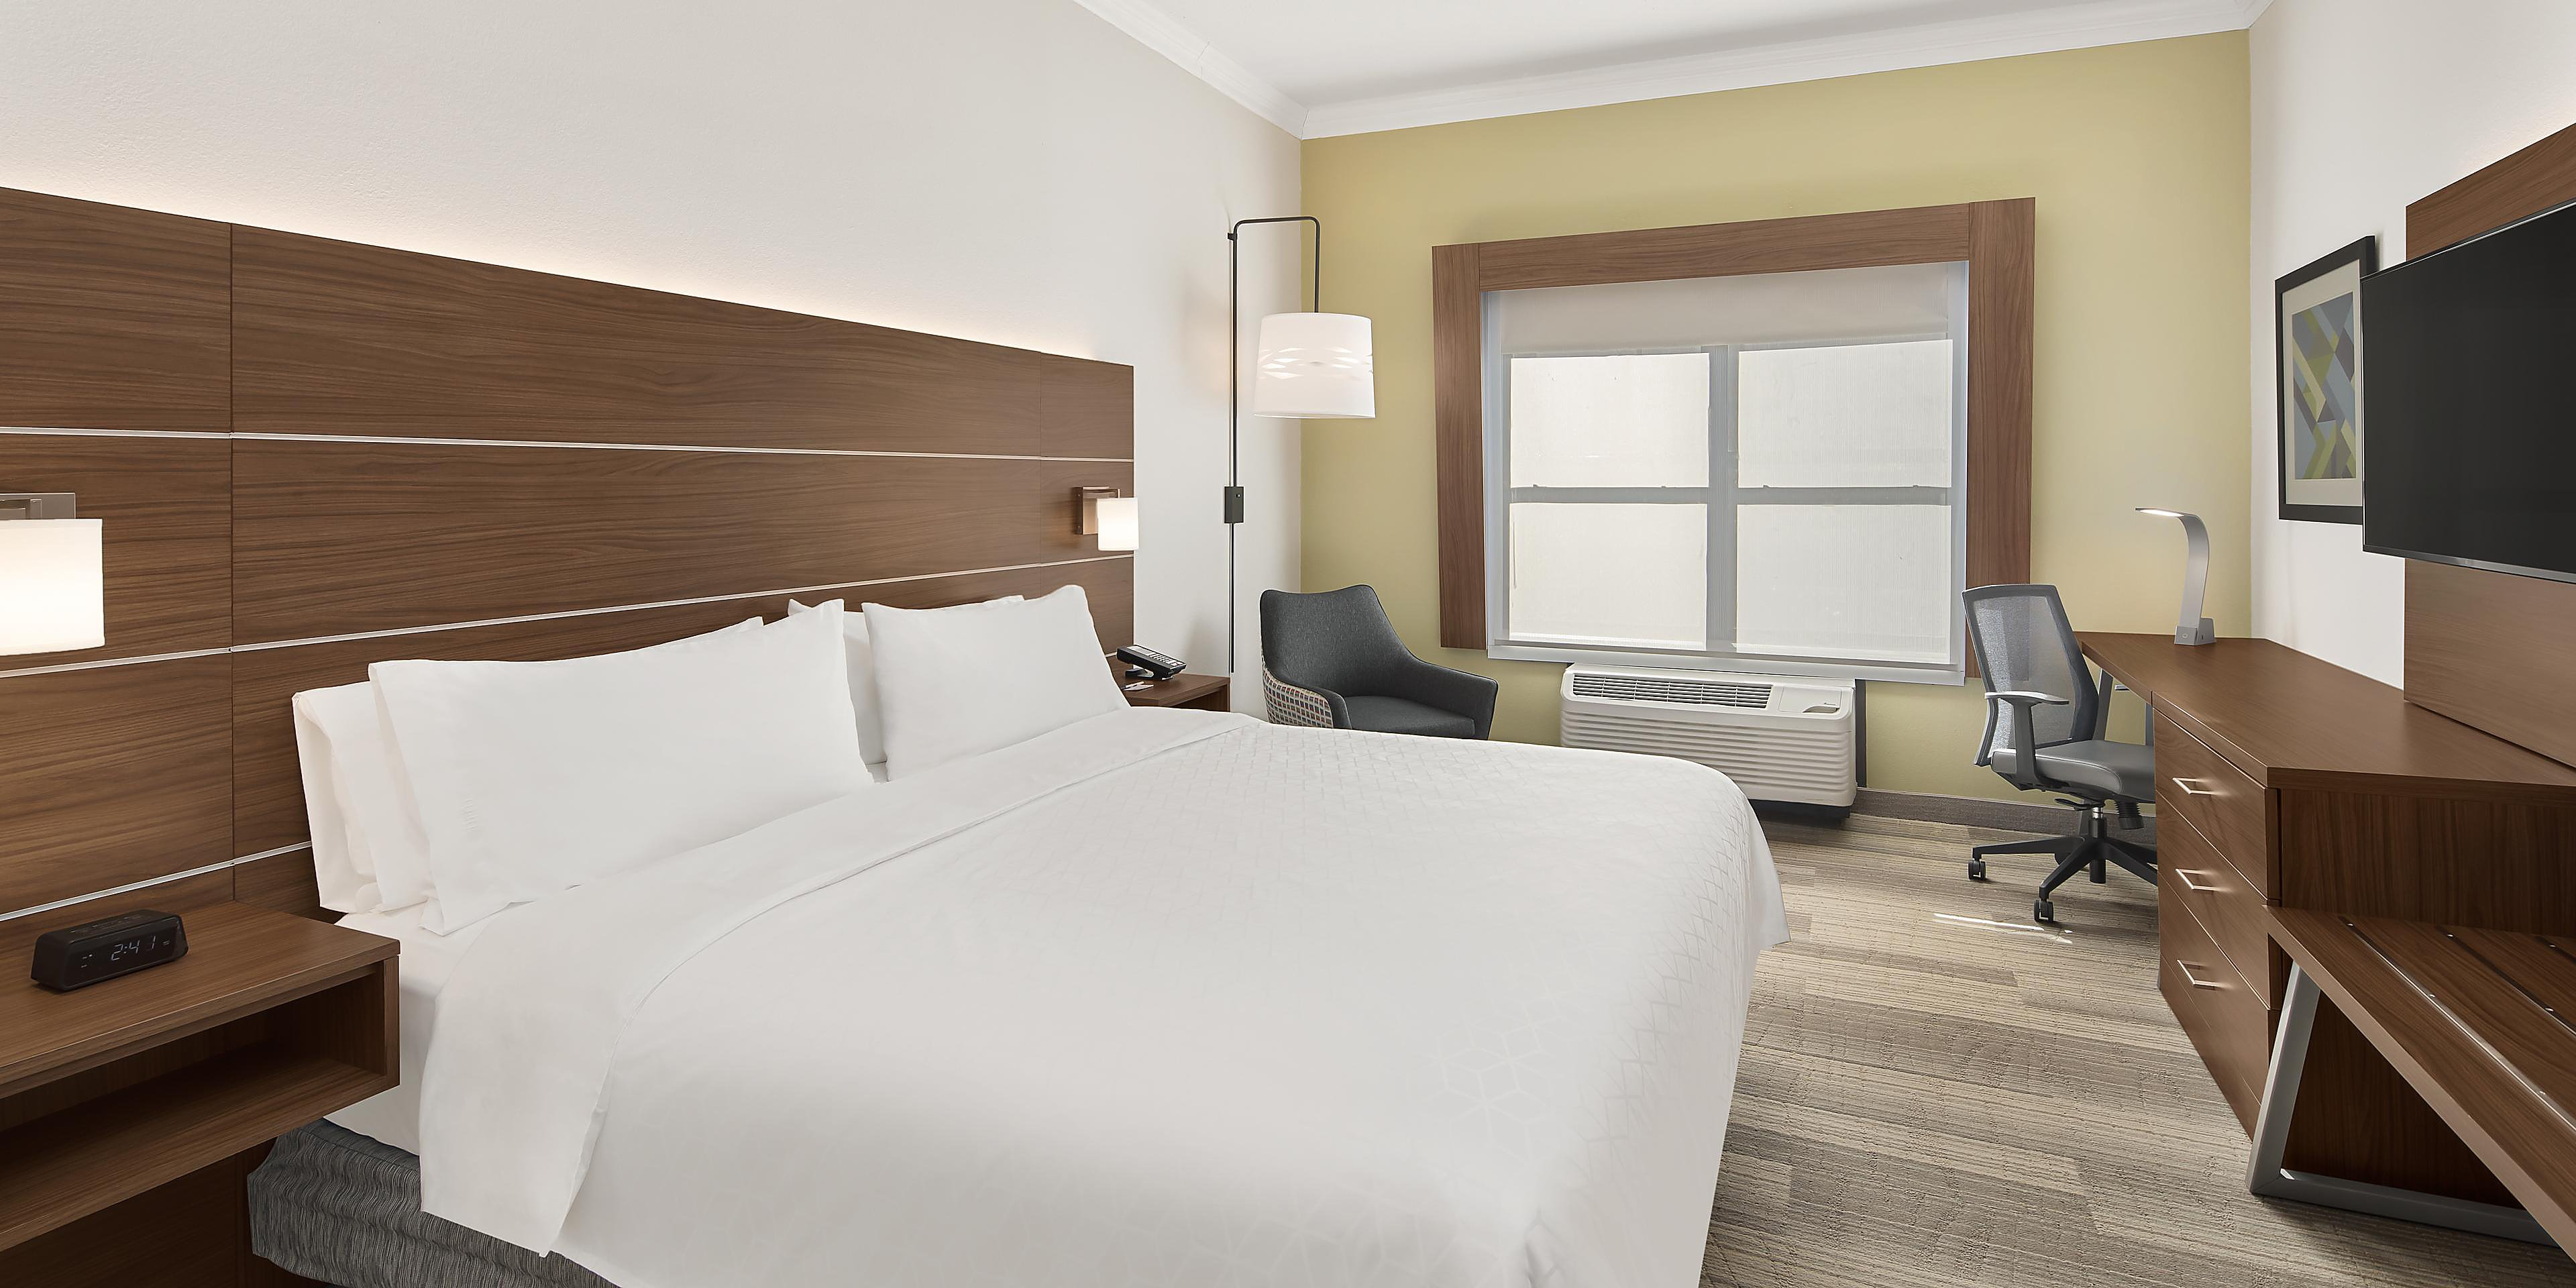 Holiday Inn Express & Suites Byron Hotel in Byron by IHG